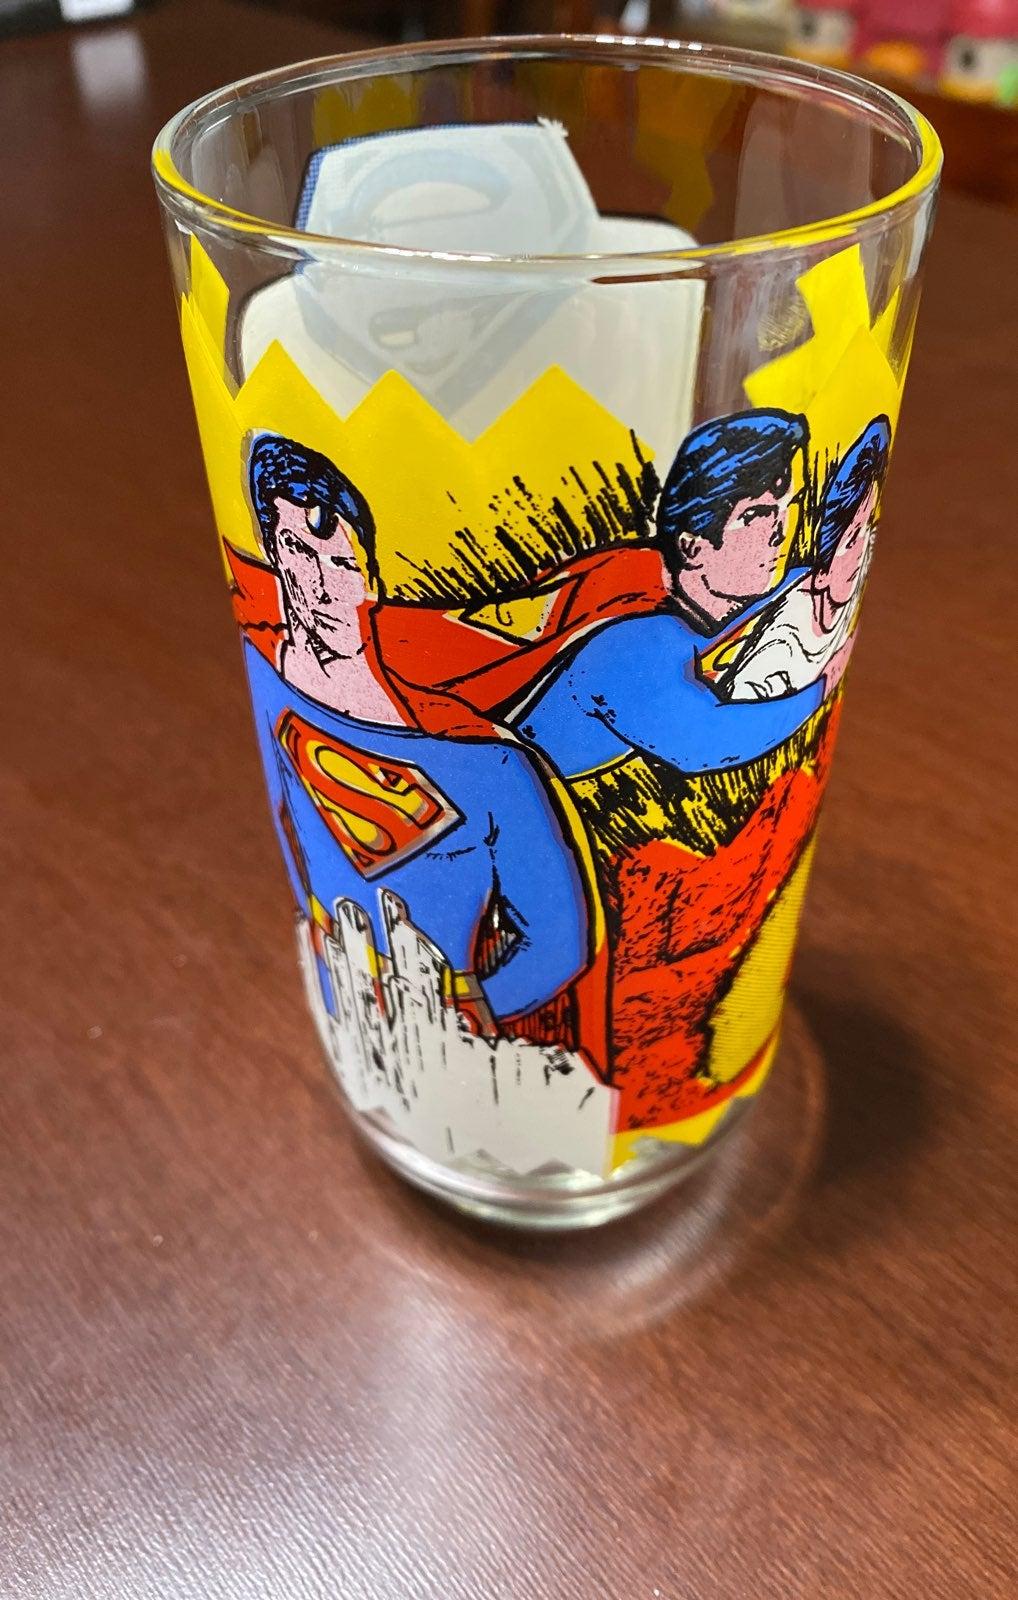 Superman The Movie Pepsi glass